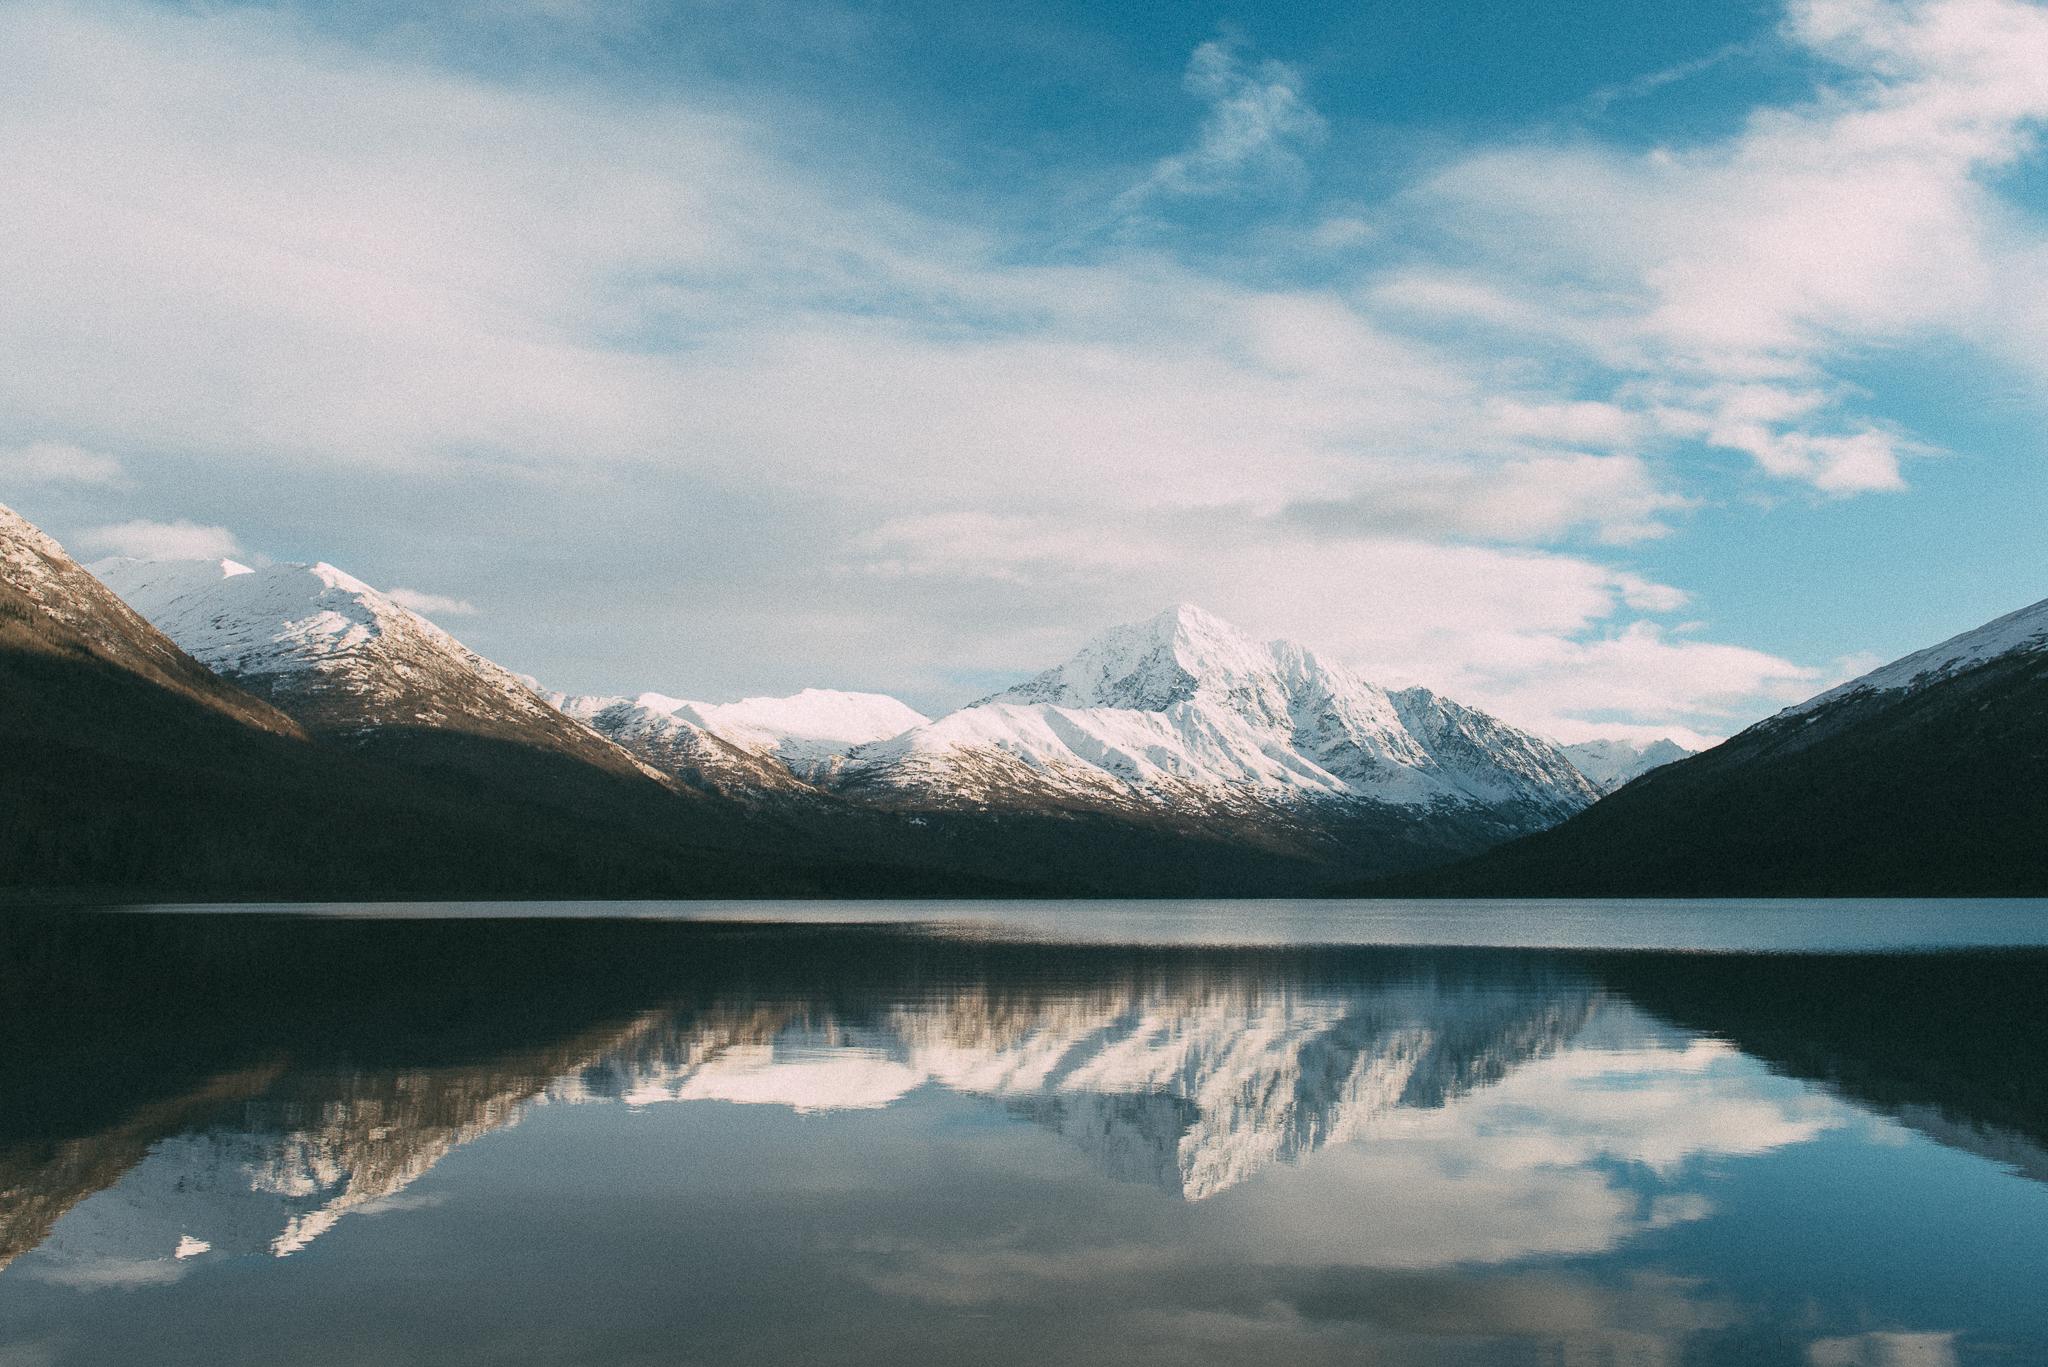 mirror reflection at lake eklutna